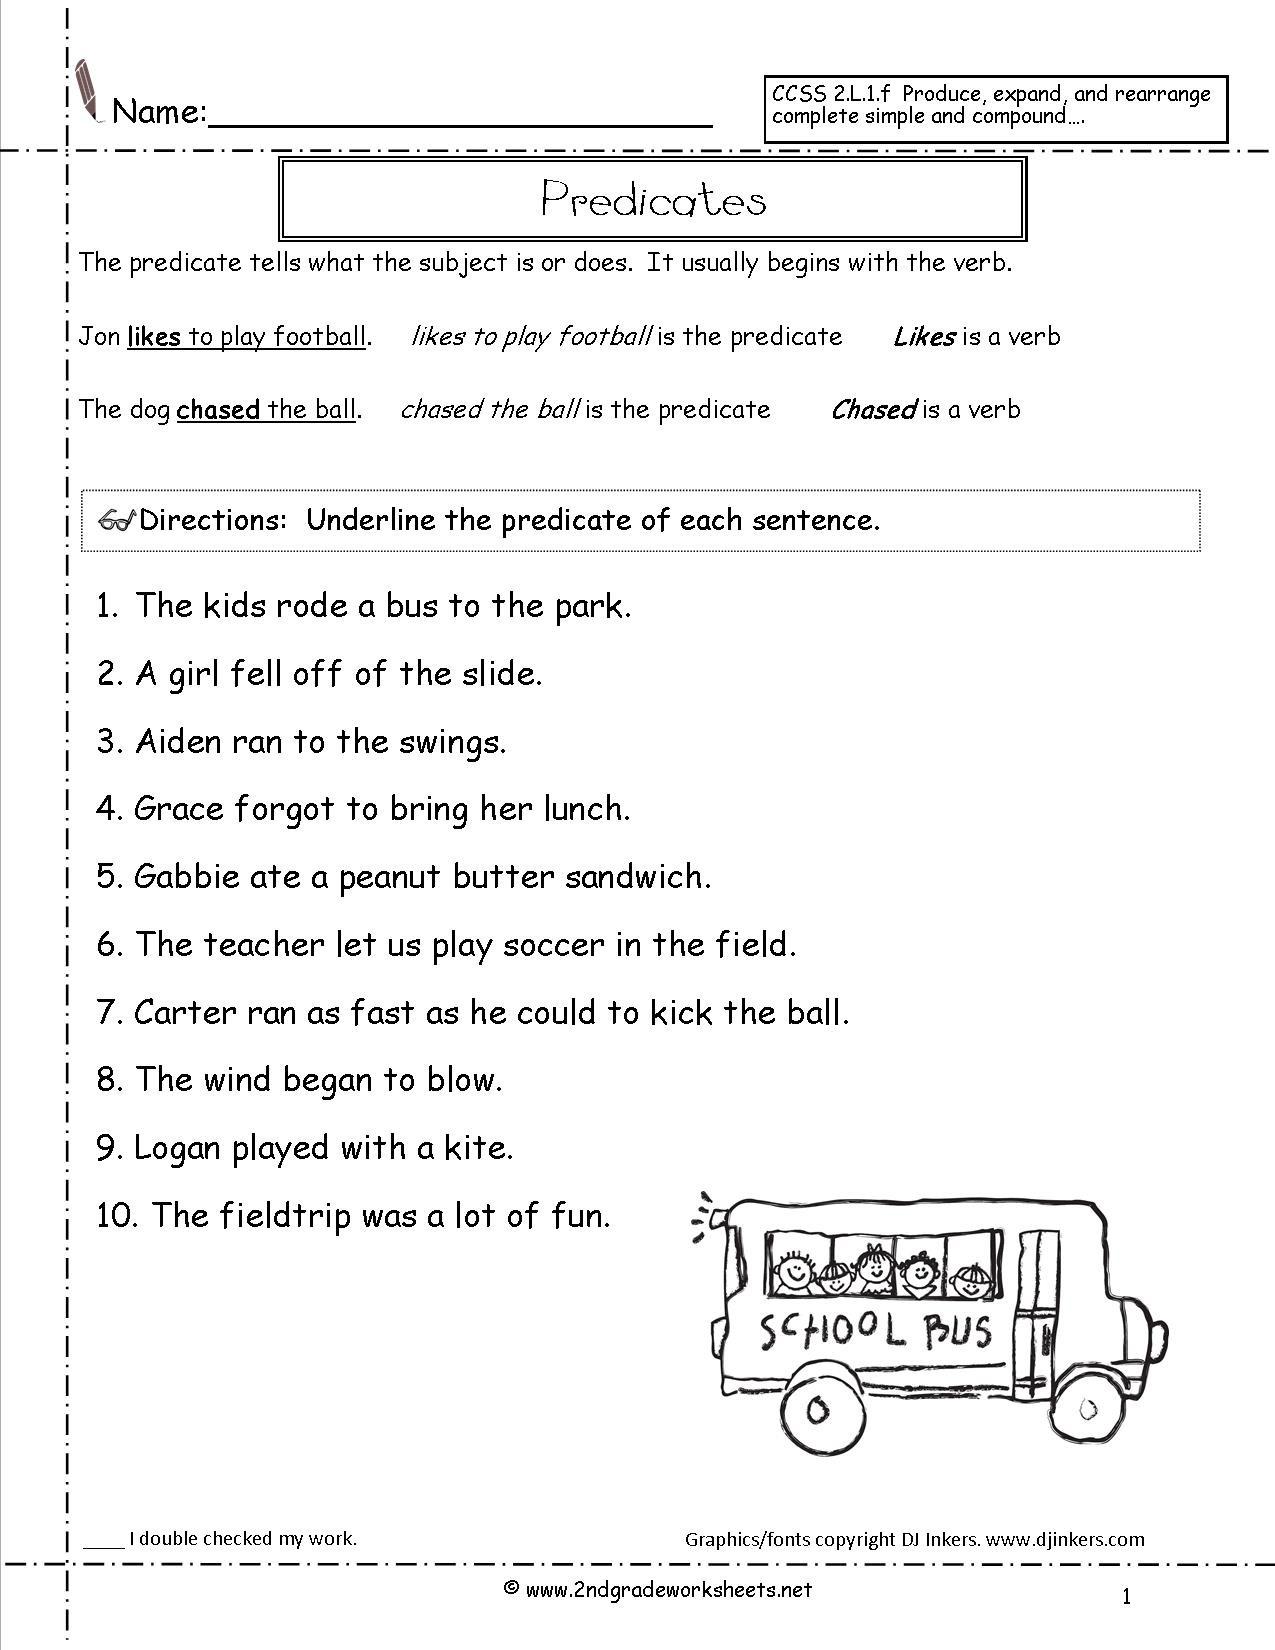 Subject Worksheets 3rd Grade Second Grade Sentences Worksheets Ccss 2 L 1 F Worksheets